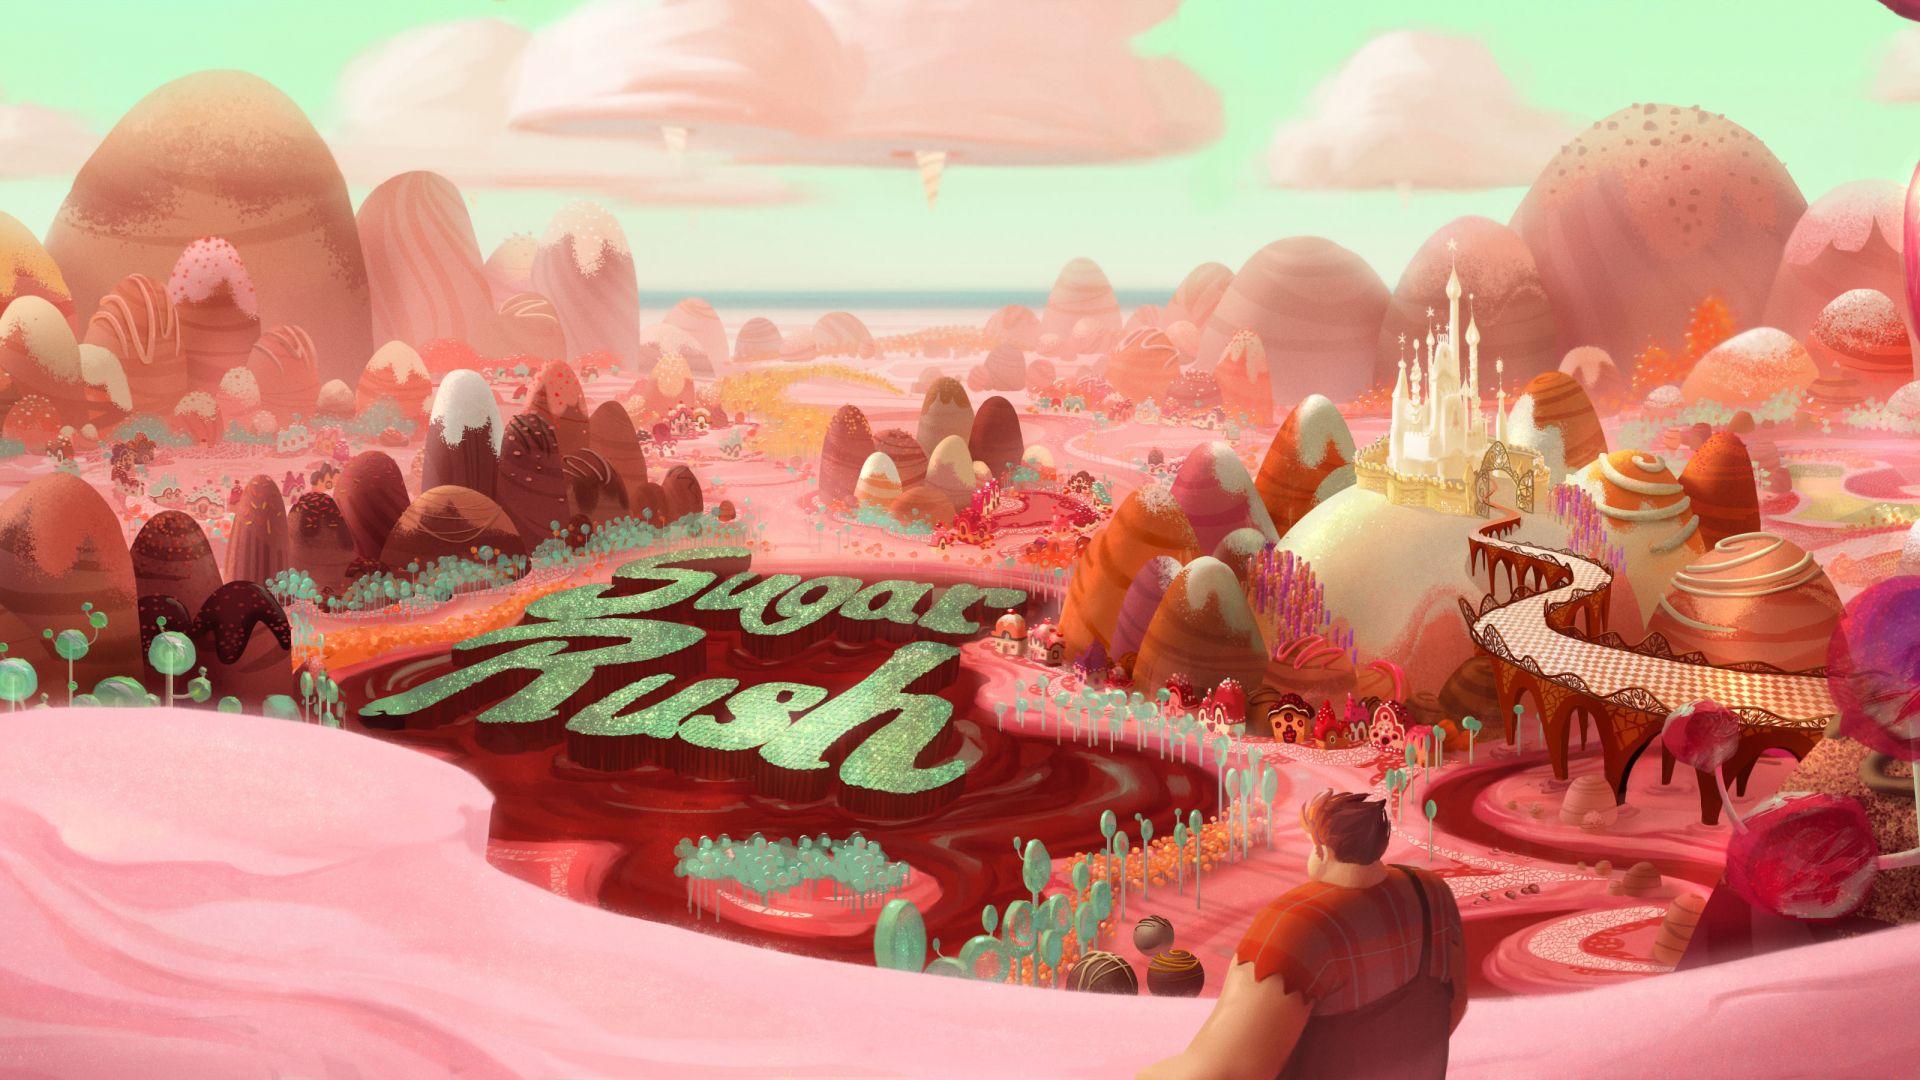 Wreck It Ralph Animation Movie 4k Hd Desktop Wallpaper For: Wallpaper Ralph Breaks The Internet: Wreck-It Ralph 2, 4k